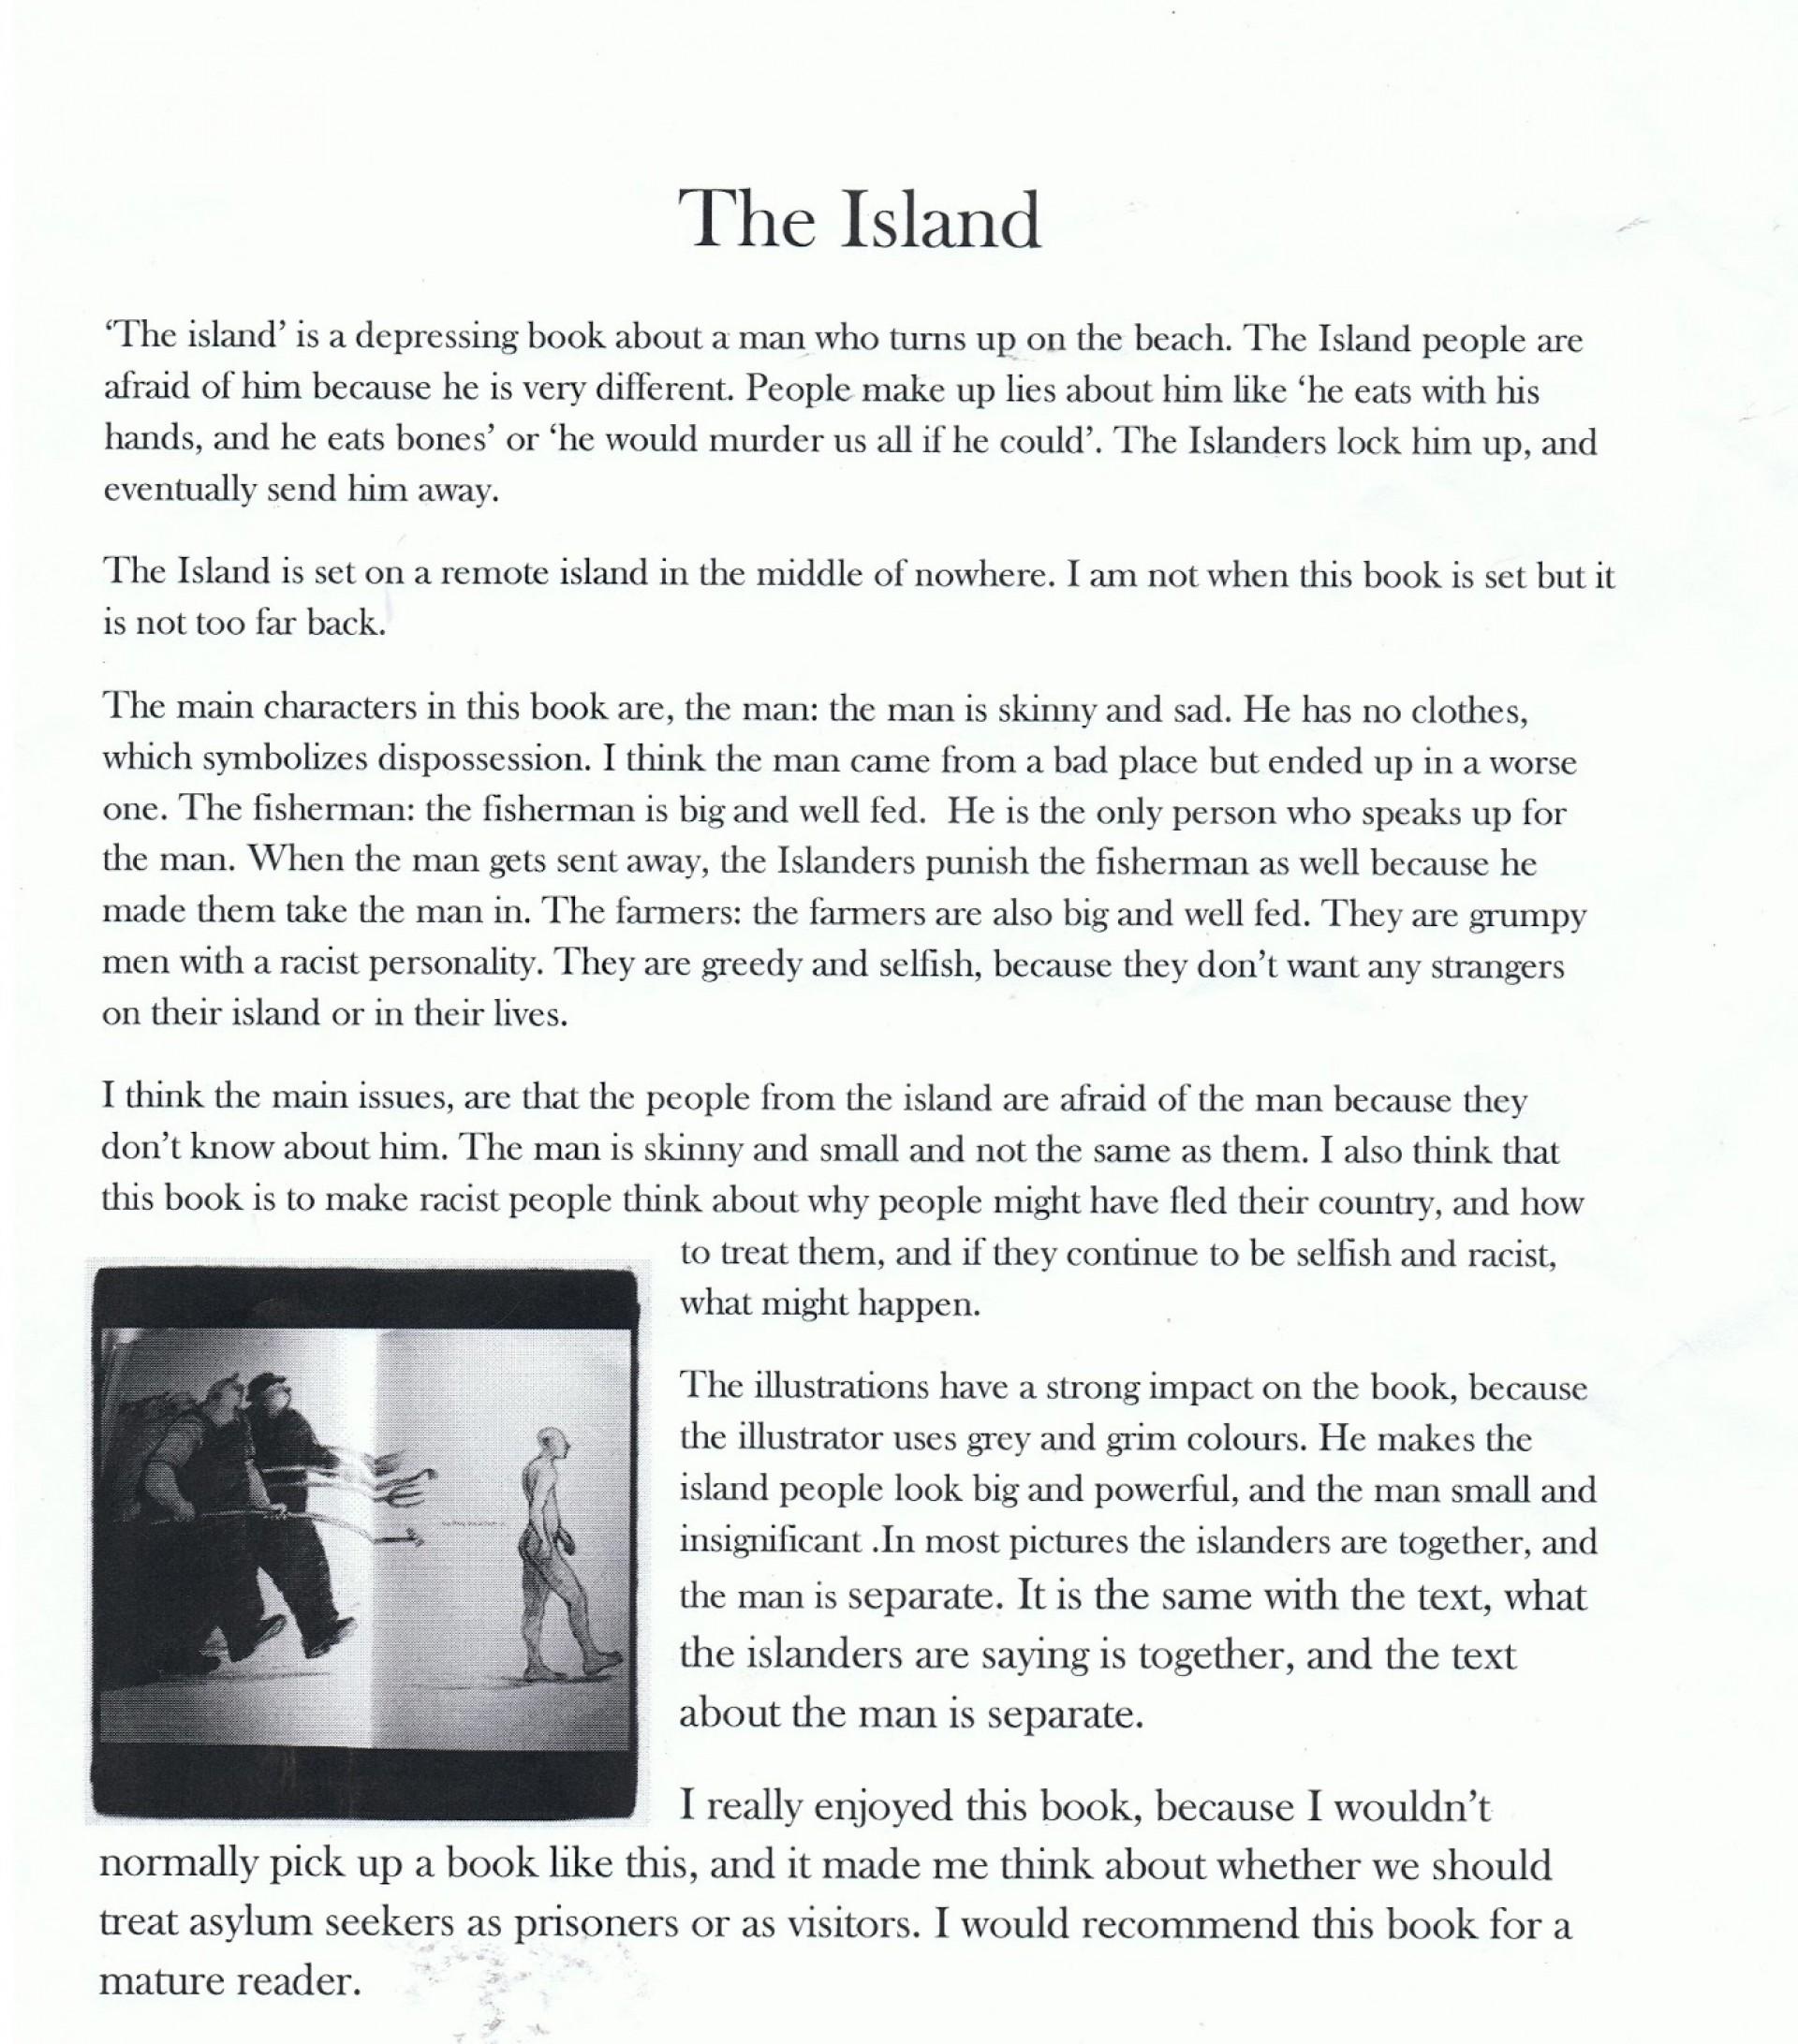 006 Essay Example Concert Report Excellent Music Appreciation Review Classical 1920